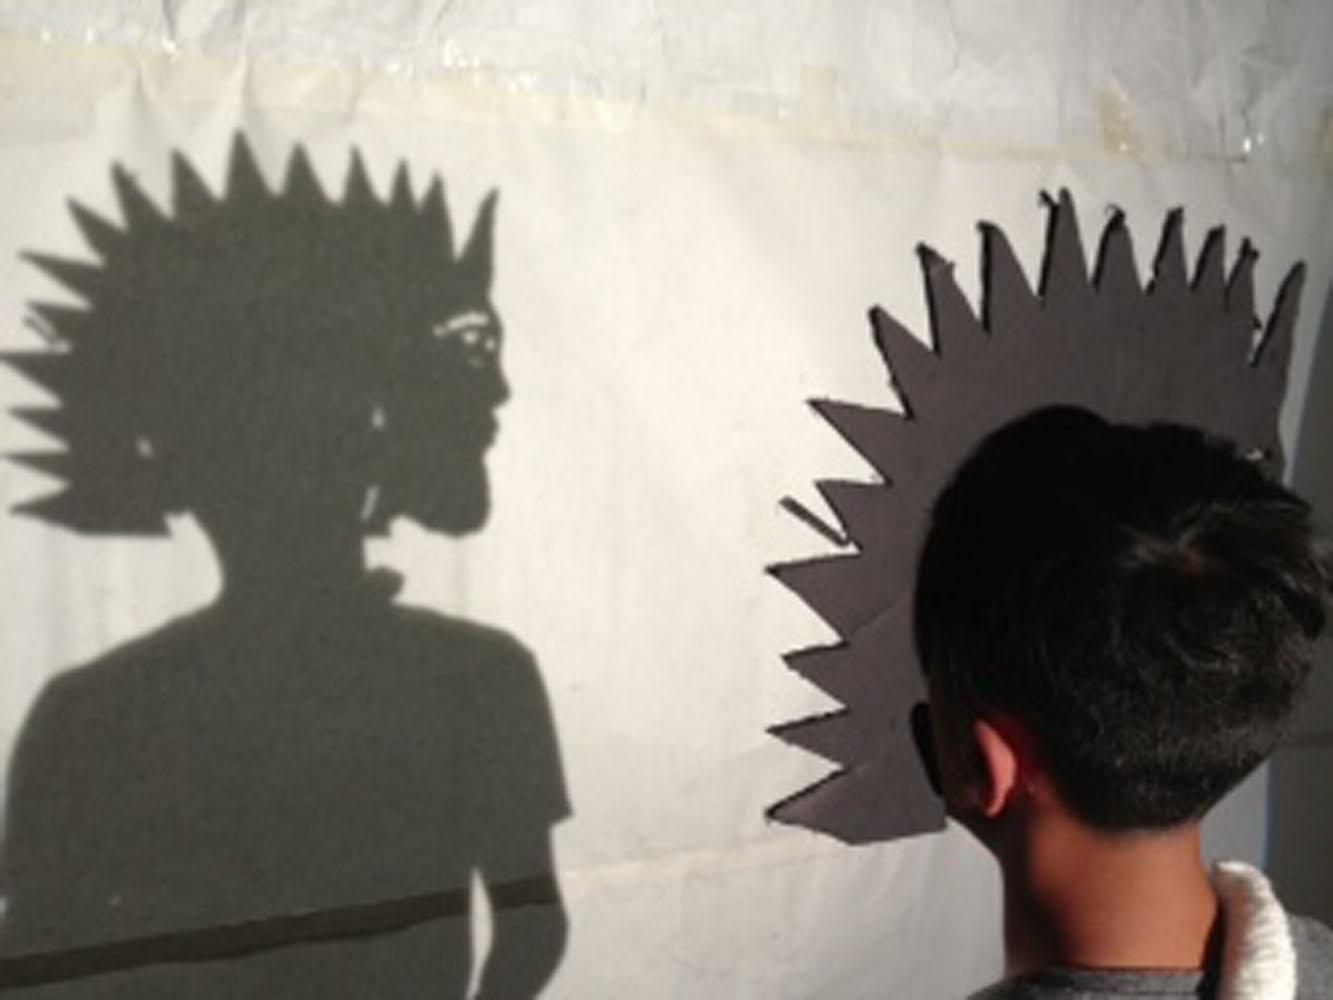 ShadowLight_Photo4 copy.jpg